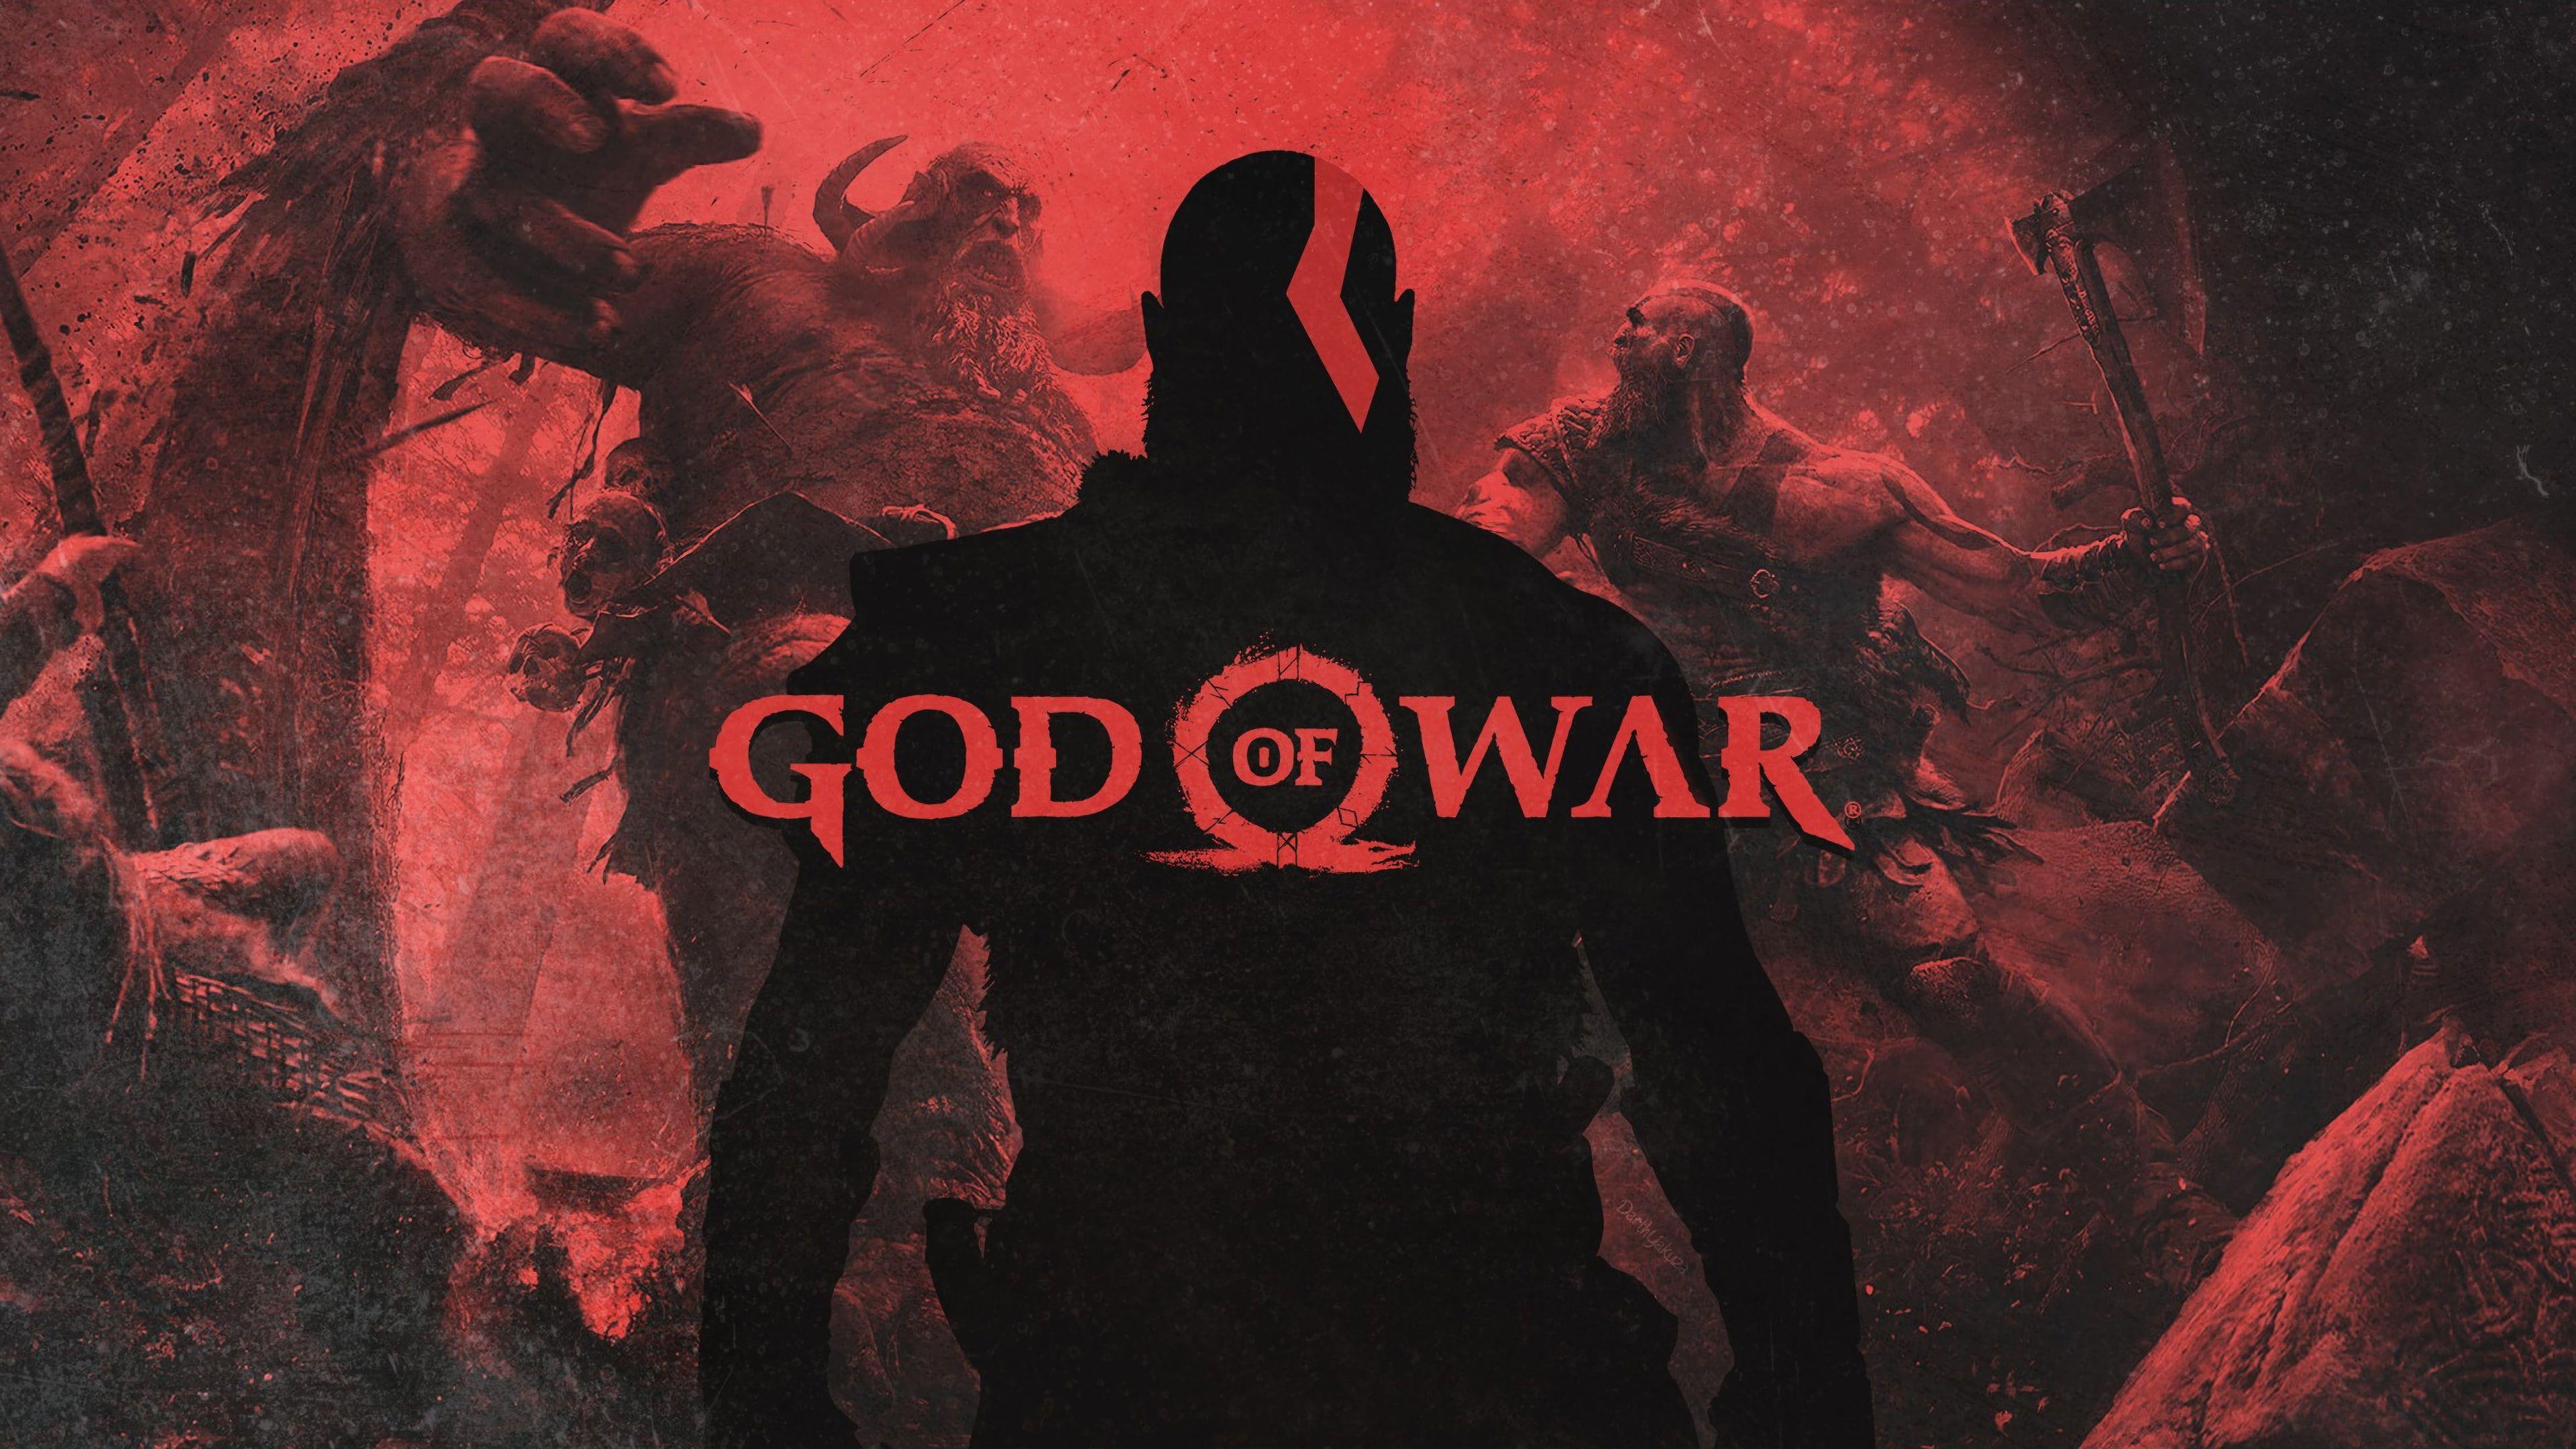 Kratos God Of War 4 God Of War 2018 Games Games Ps Games Hd 4k 4k Wallpaper Hdwallpaper Desktop God Of War Kratos God Of War War God of war 4 wallpaper 4k pc